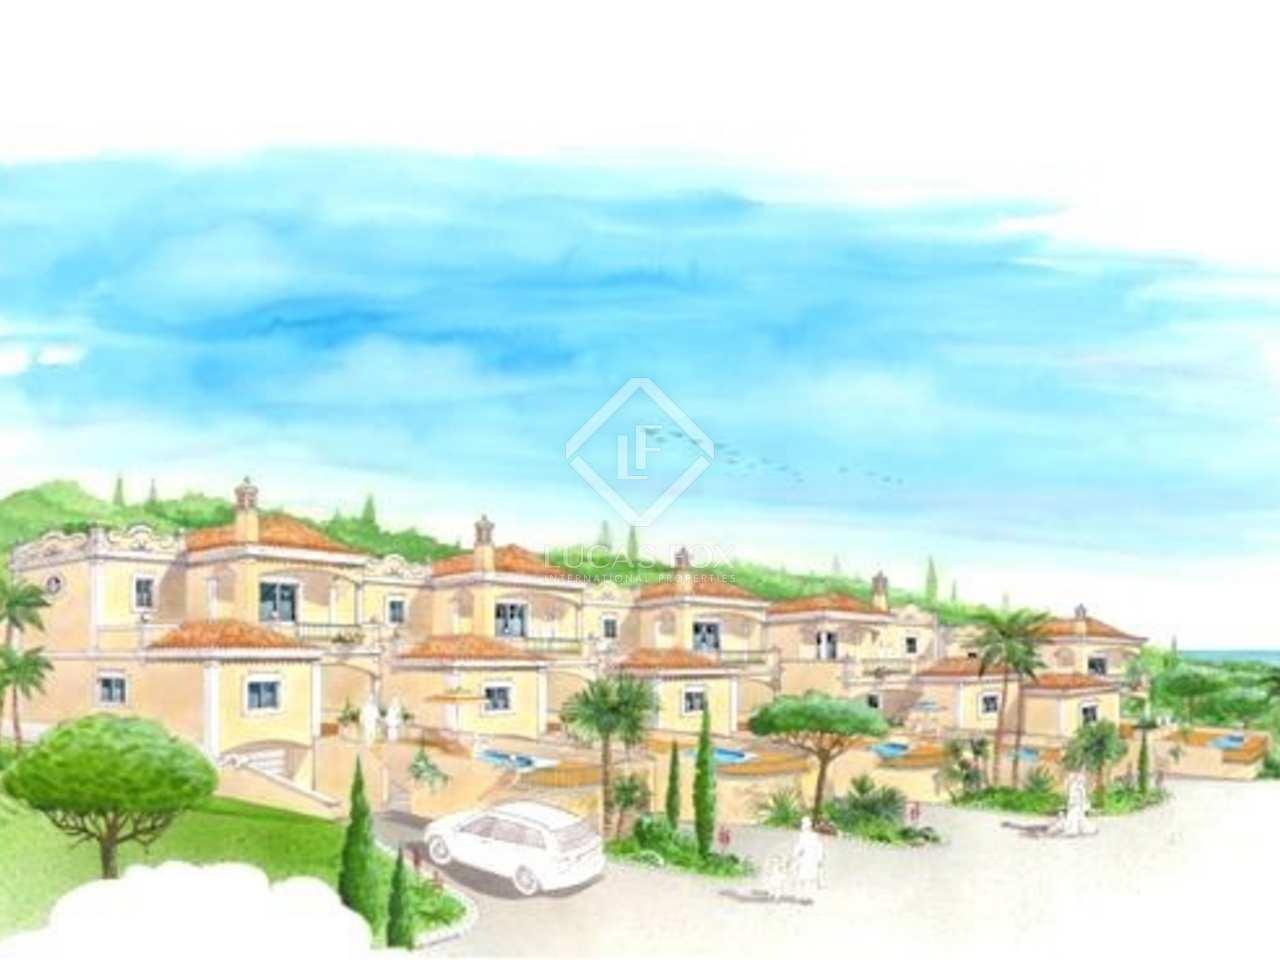 232m haus villa zum verkauf in algarve portugal. Black Bedroom Furniture Sets. Home Design Ideas